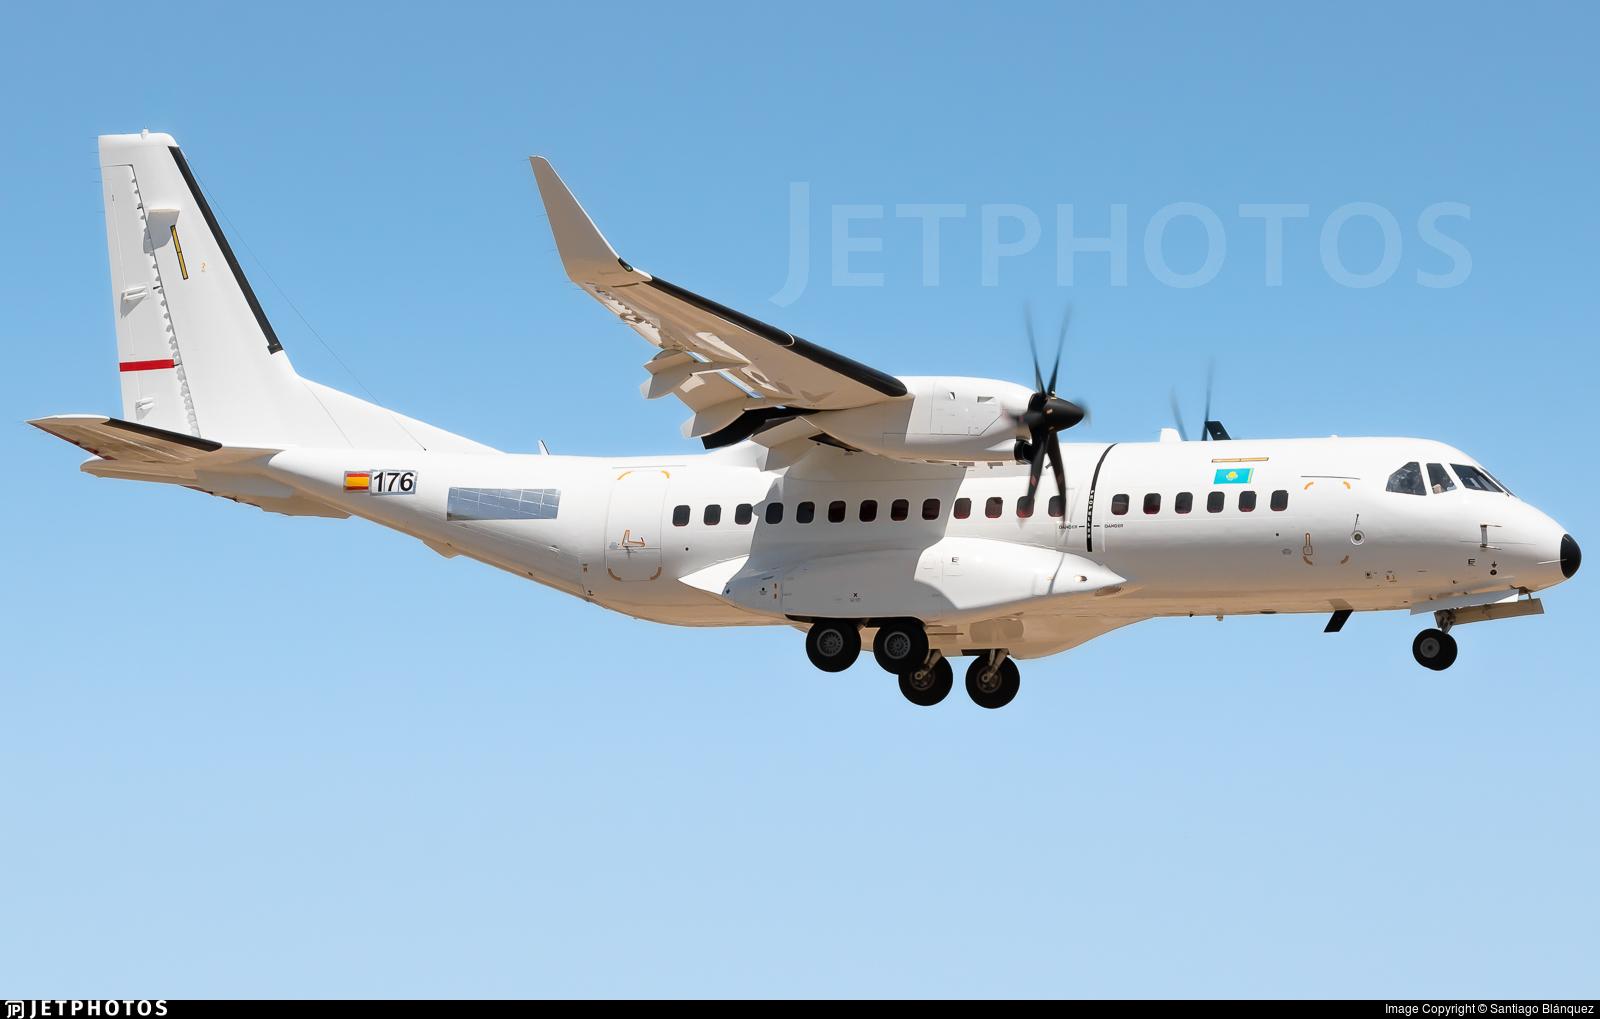 176 - Airbus C295W - Kazakhstan - Border Guard